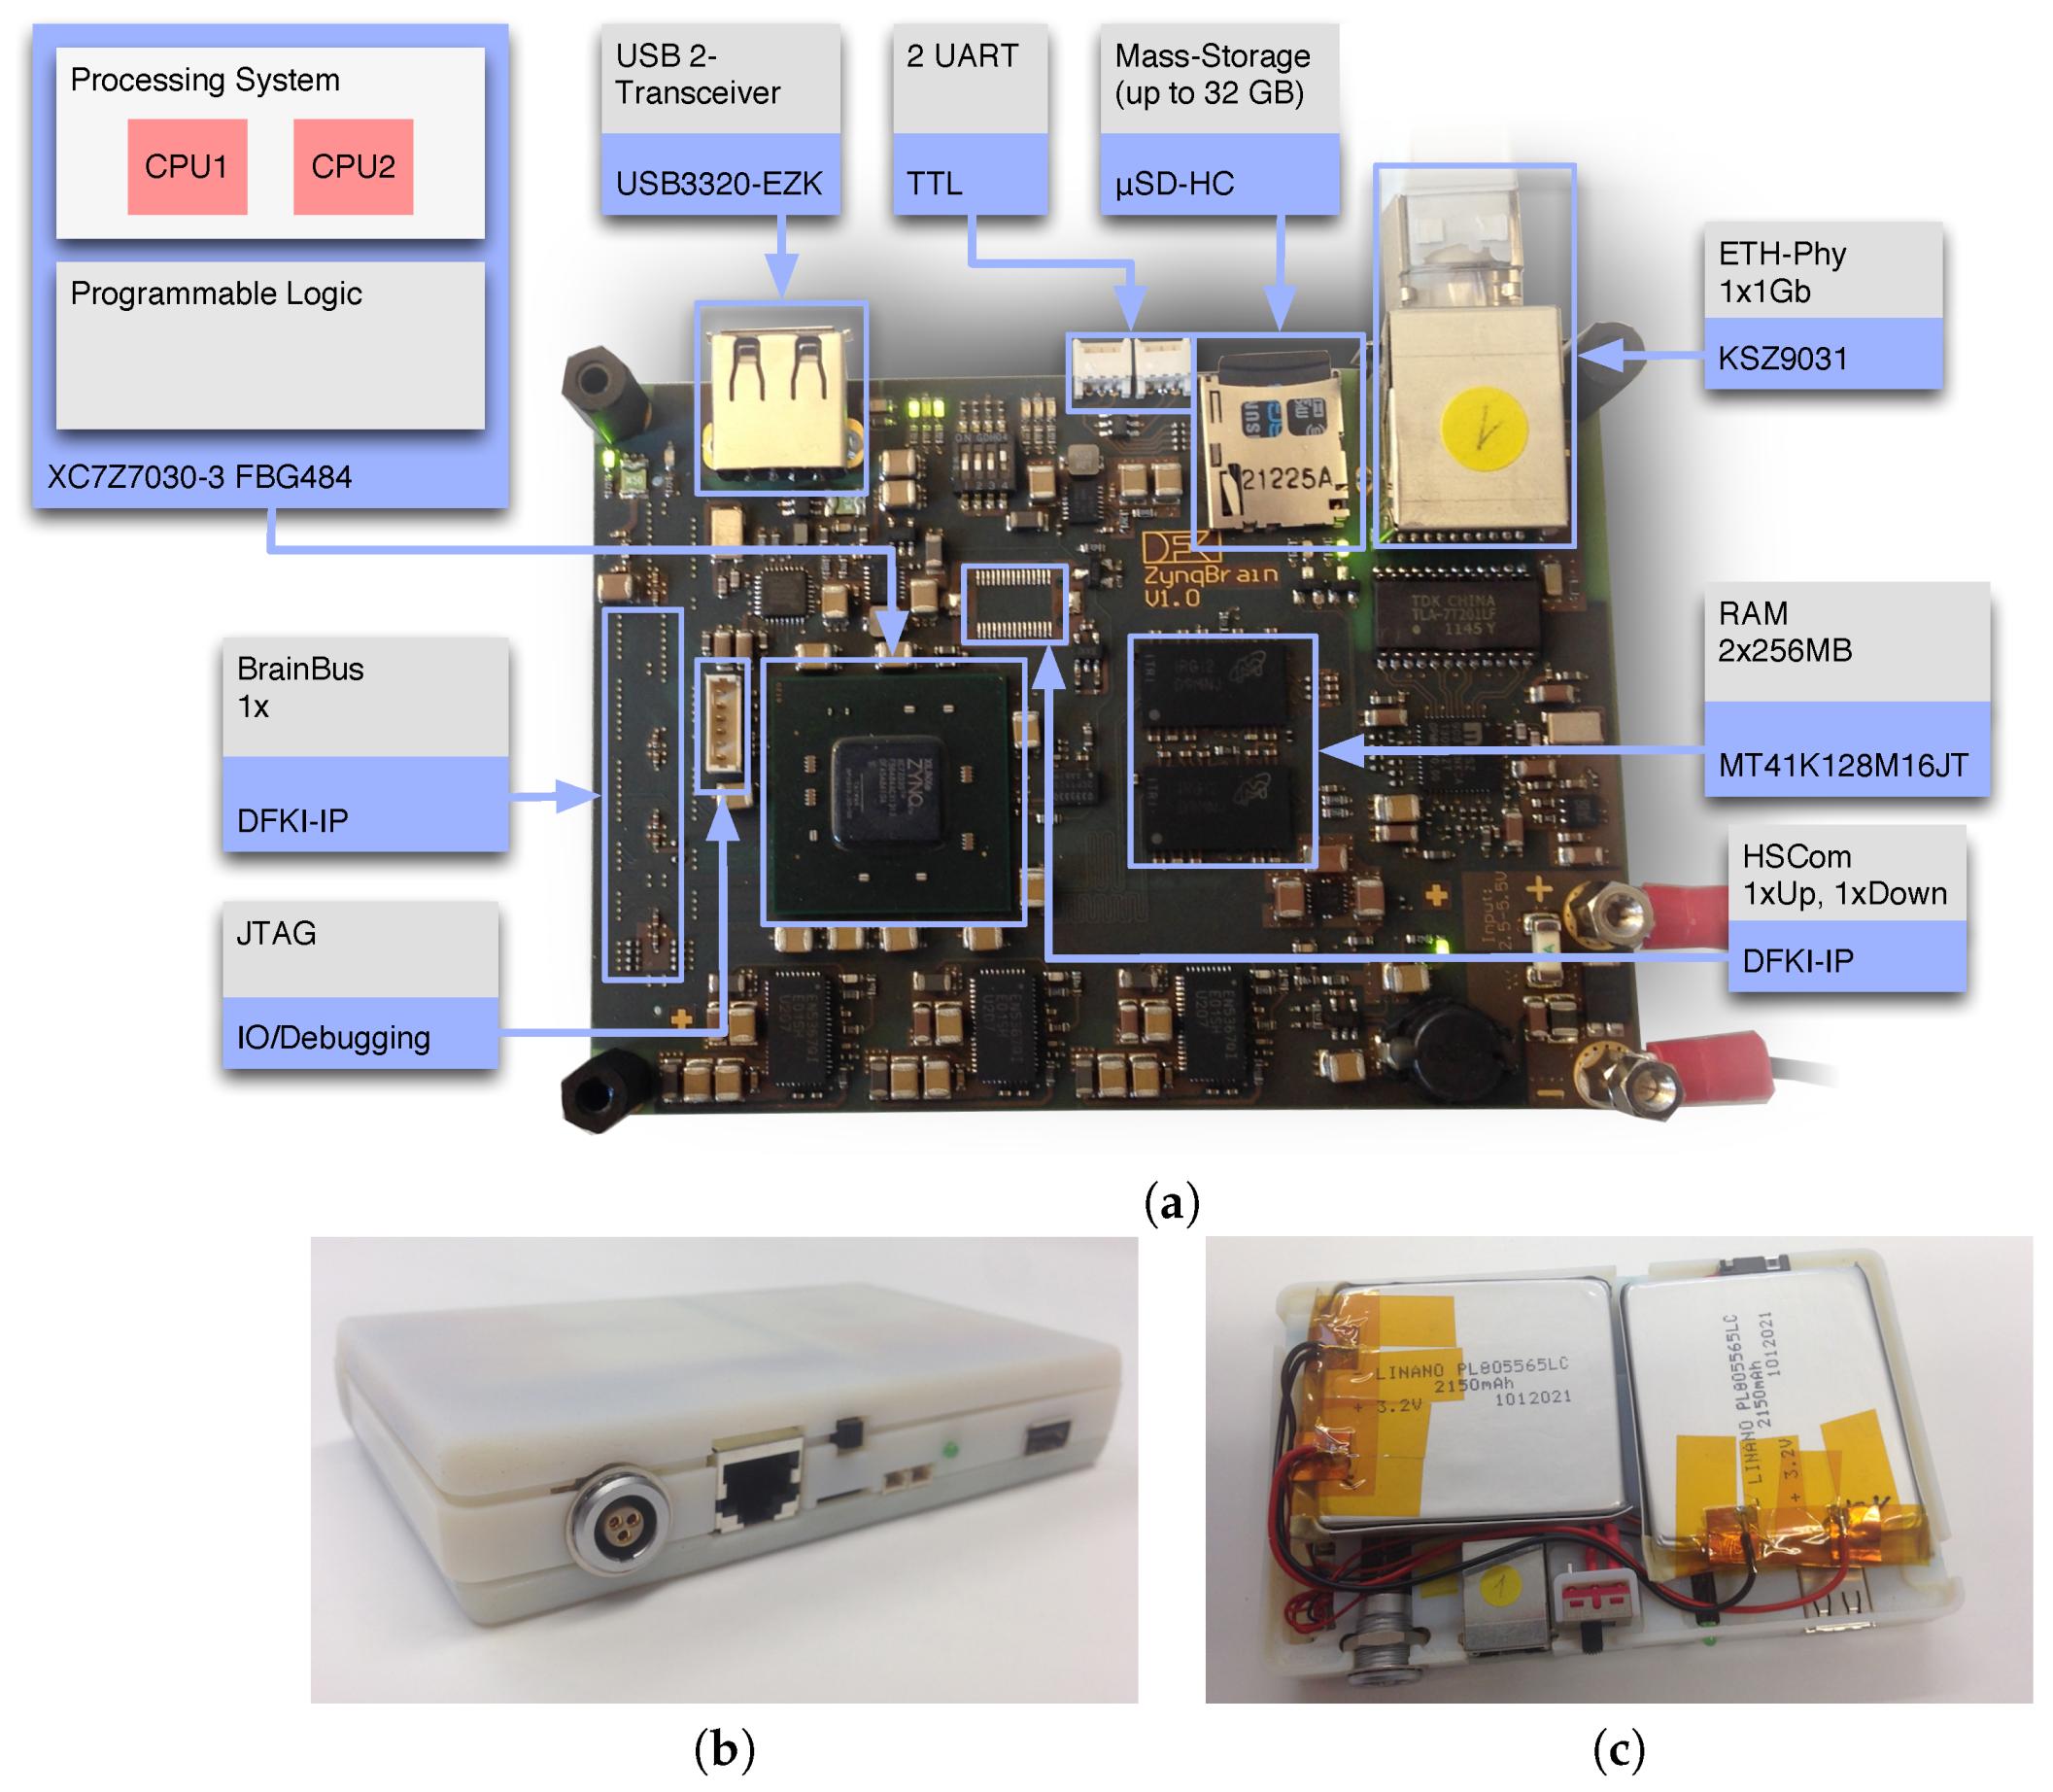 Sensors Free Full Text A Hybrid Fpga Based System For Eeg And Emg Based Online Movement Prediction Html